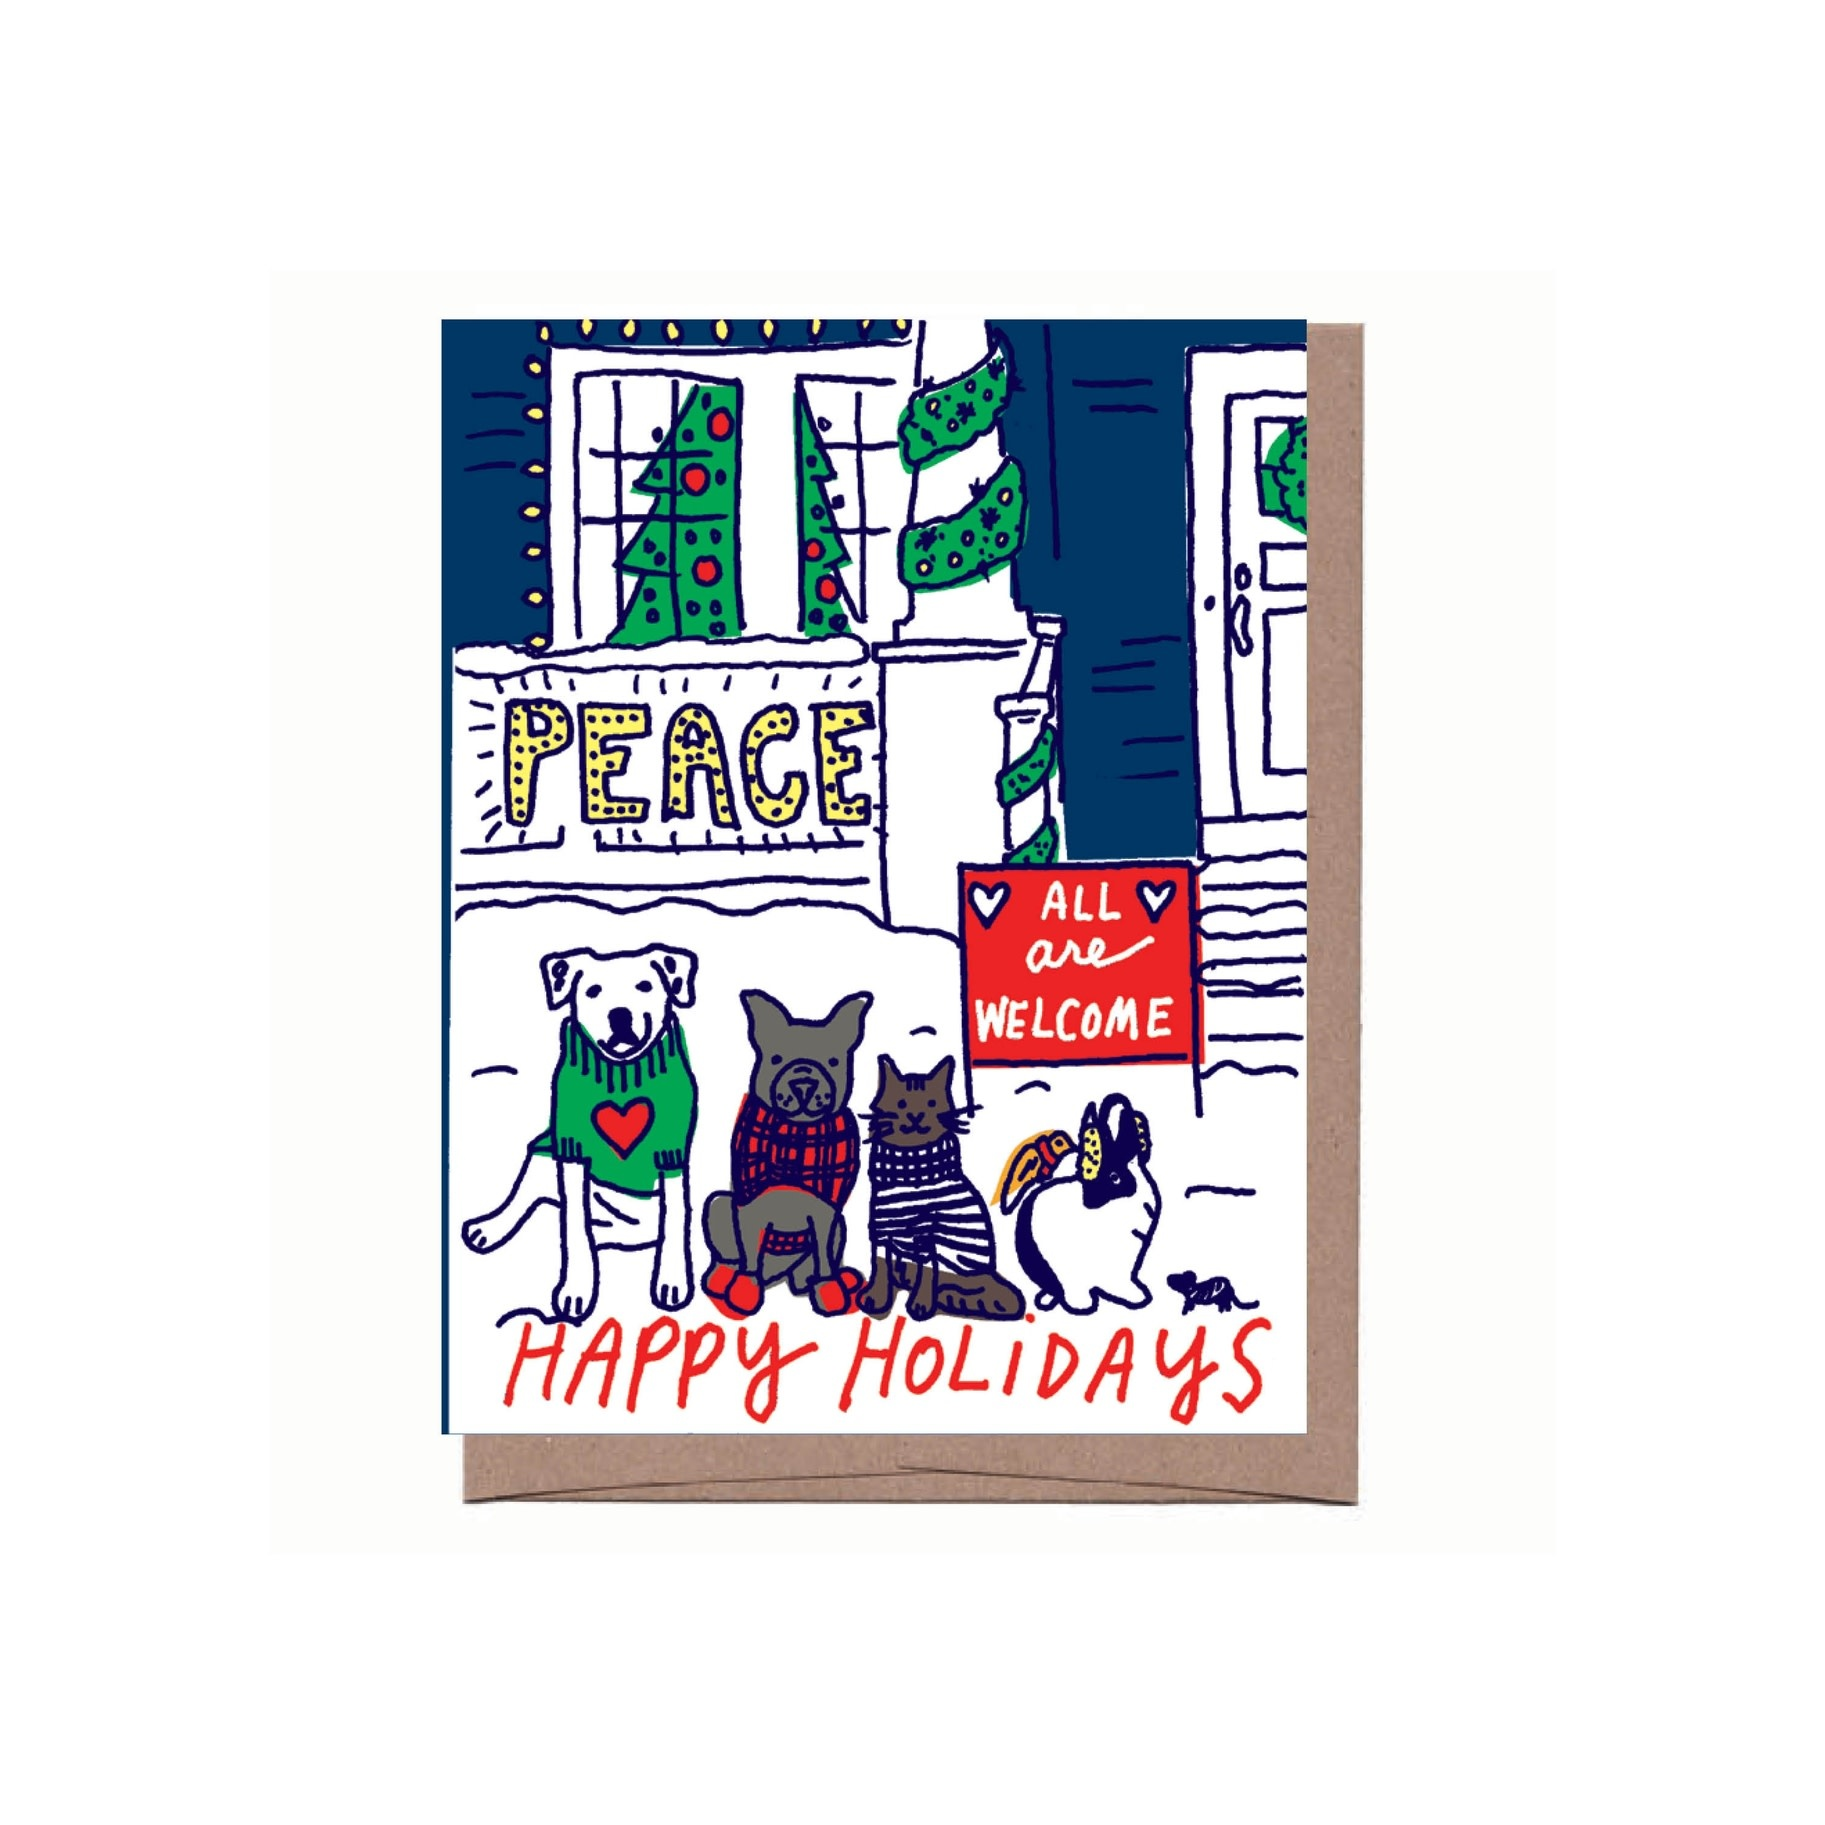 La Familia Green - LFG LFGGCHO0013 - All Are Welcome Holiday